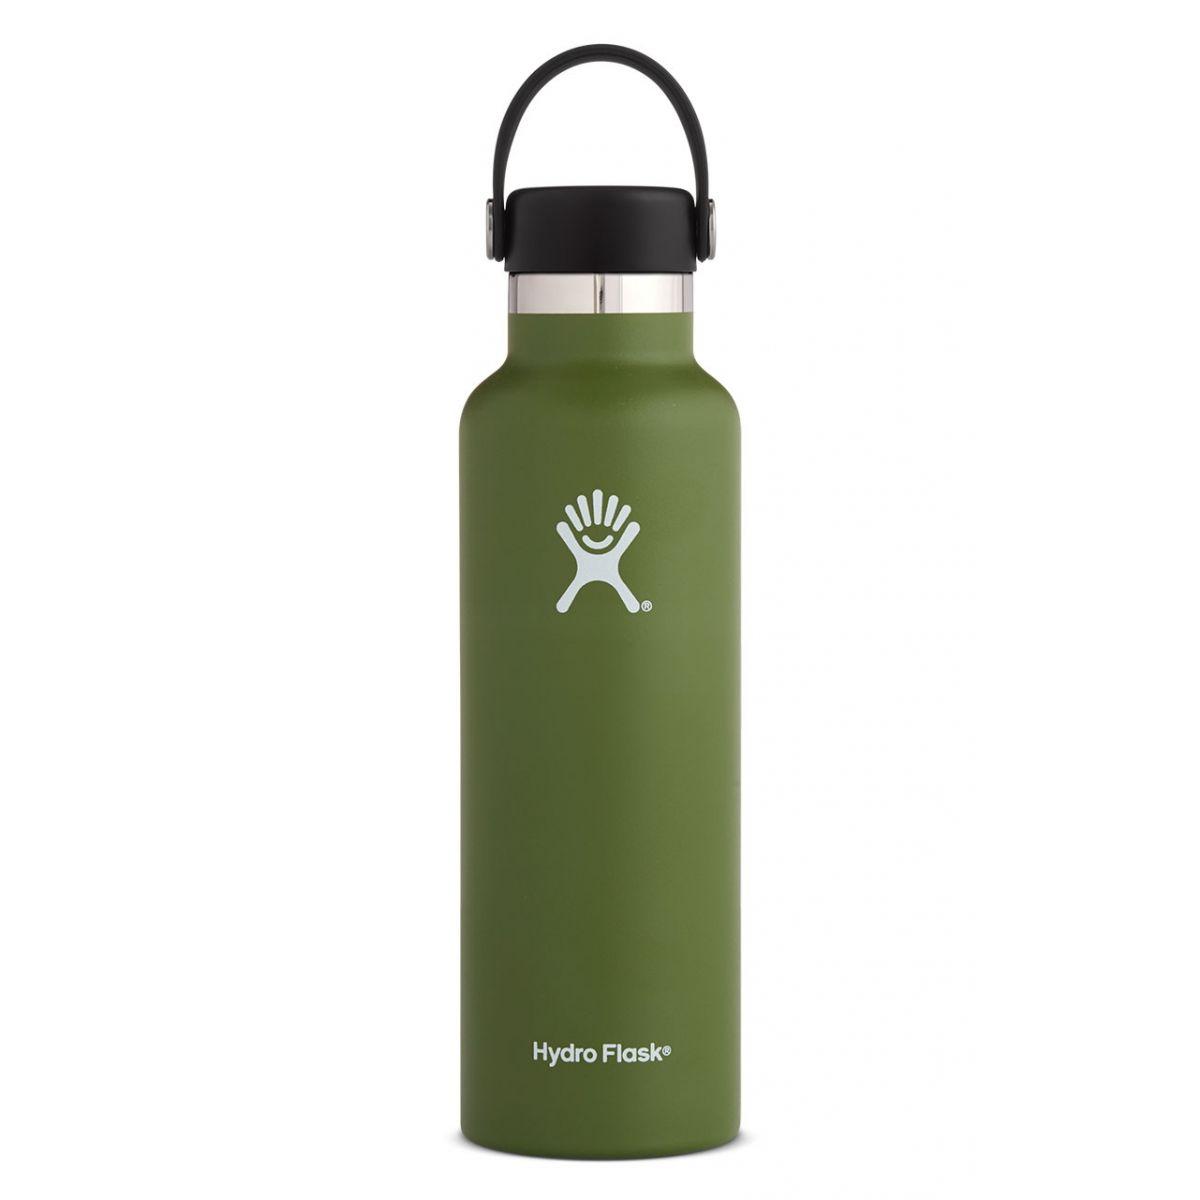 Hydroflask 21 oz standard cap olive